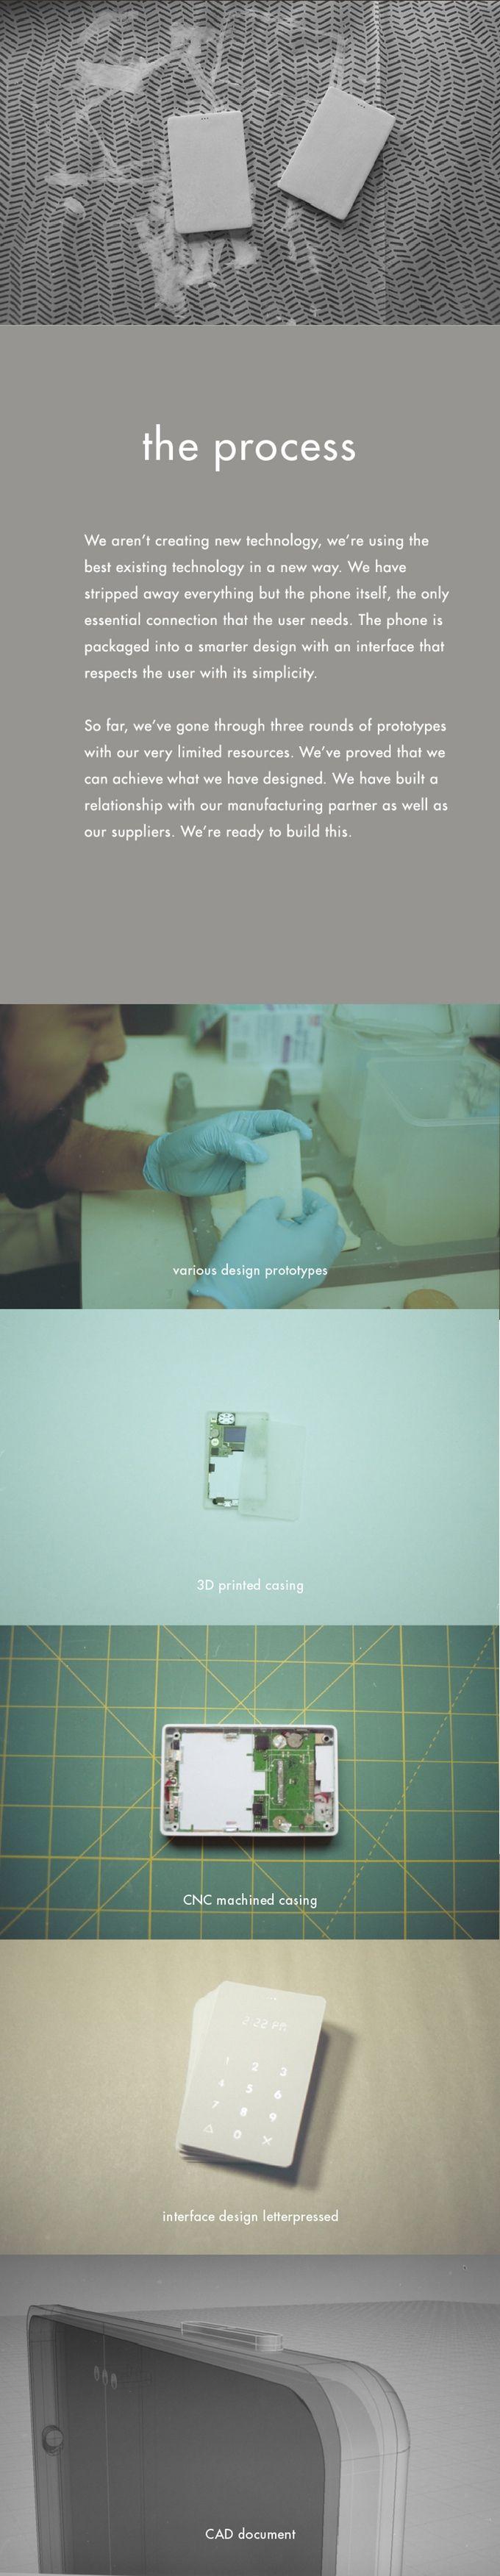 Led night light kickstarter - The Light Phone By Light Kickstarter